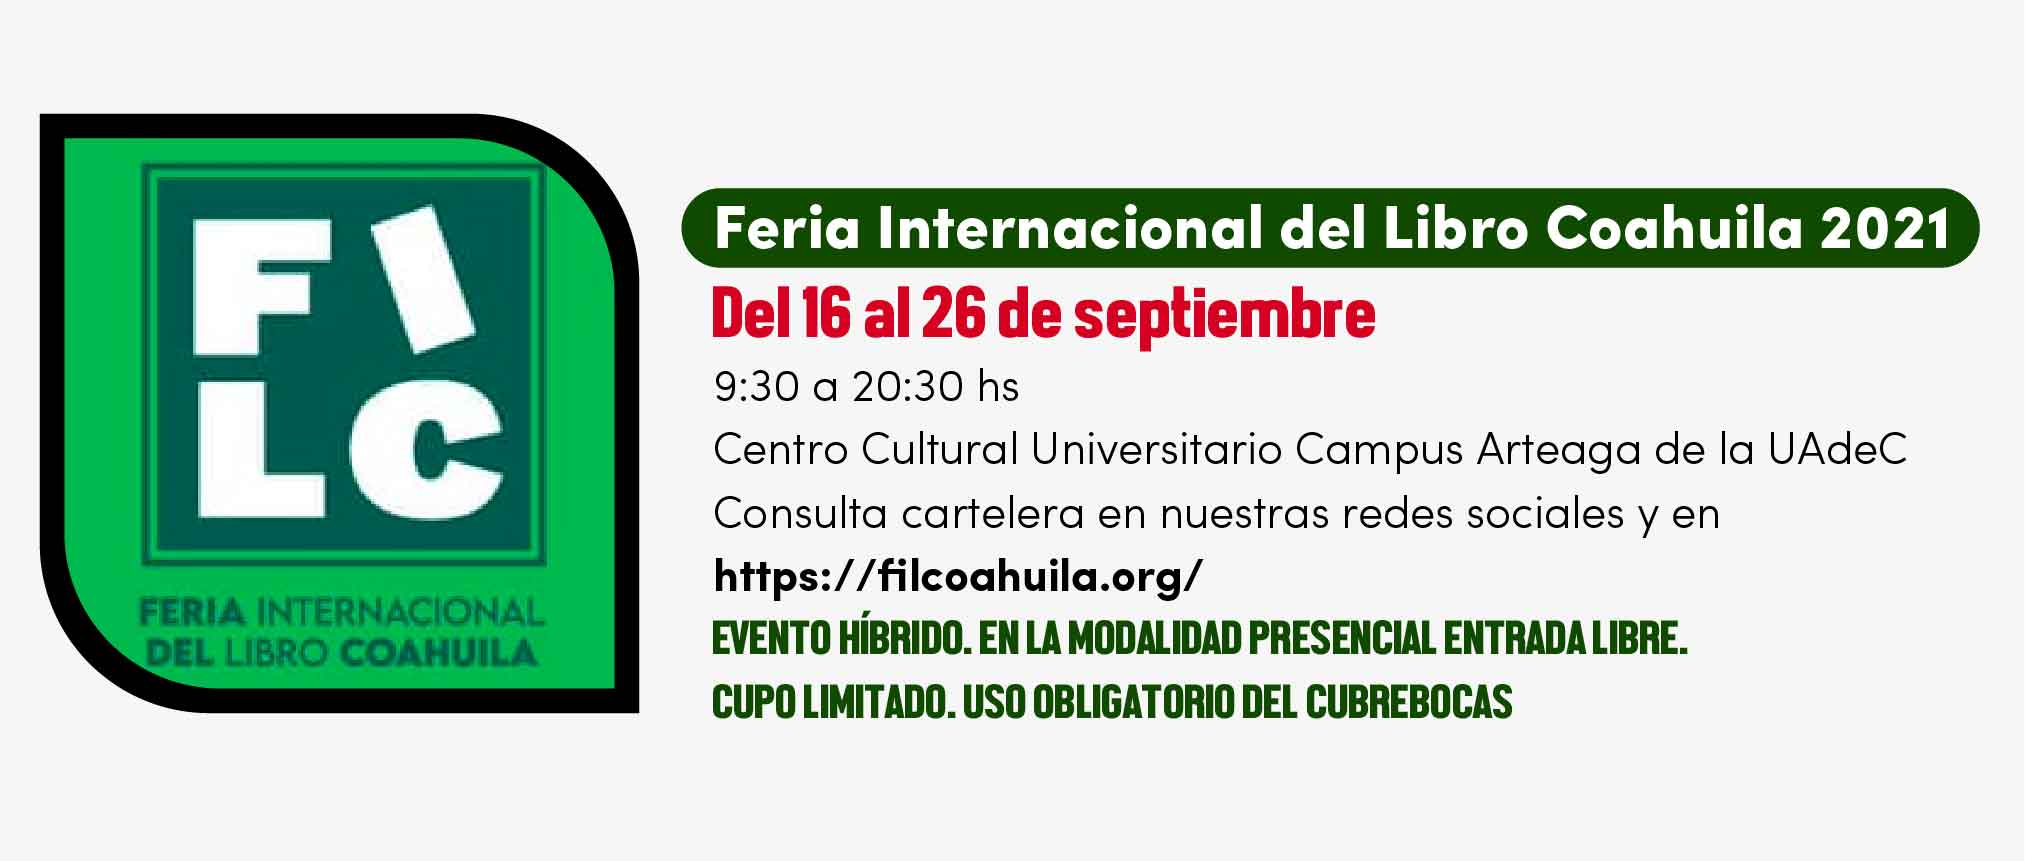 FERIA INTERNACIONAL DEL LIBRO COAHUILA 2021